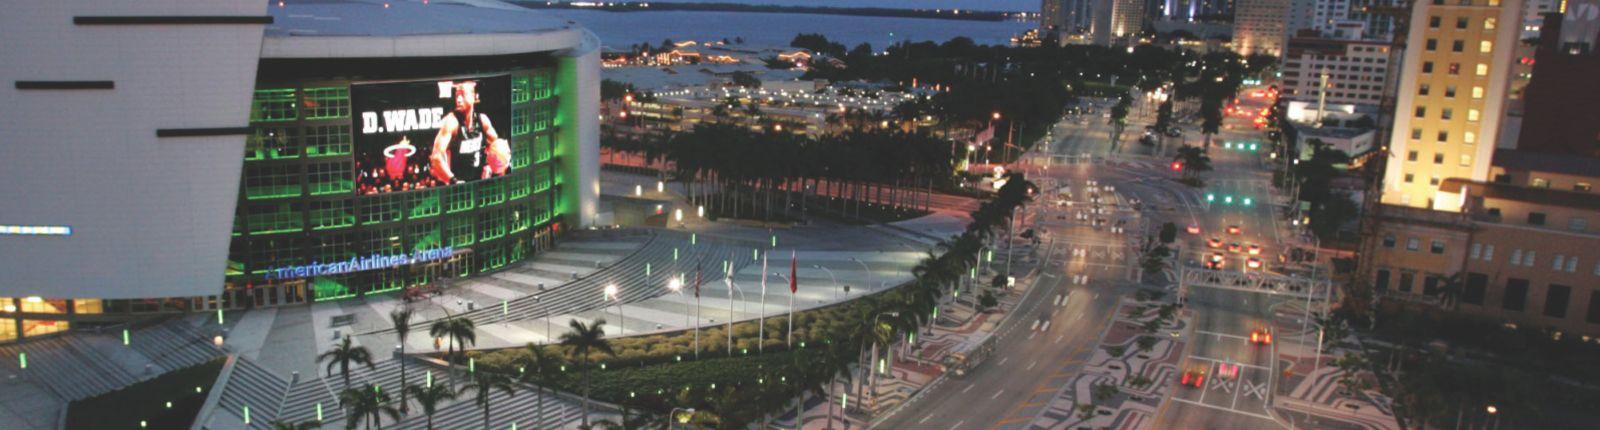 Transparent media façade at the American Airlines Arena in Miami